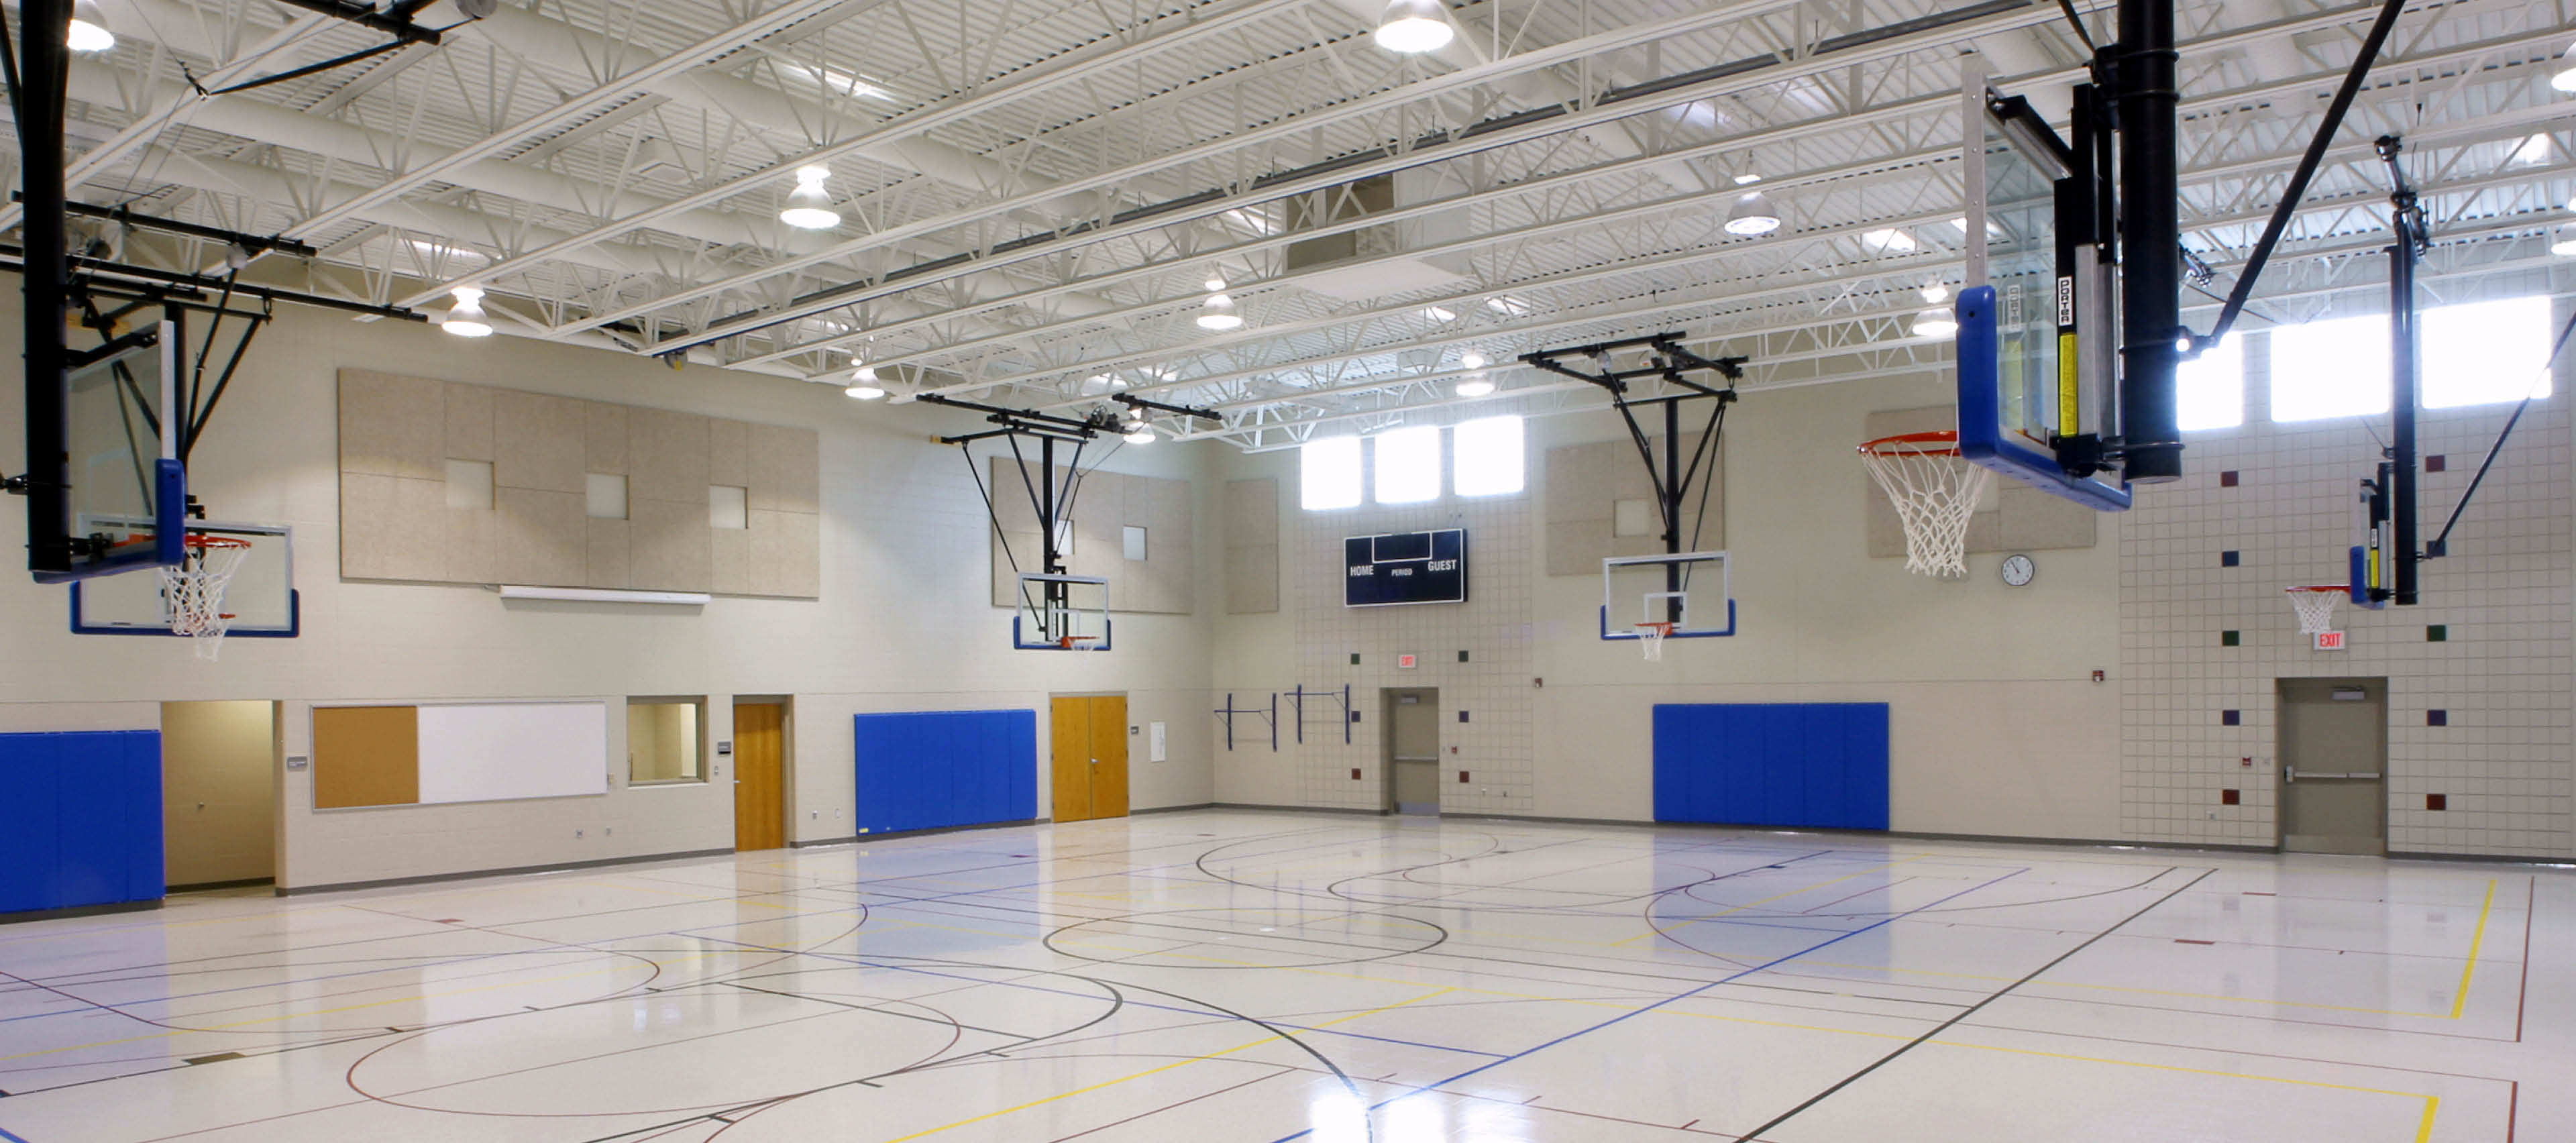 Basktel ball court